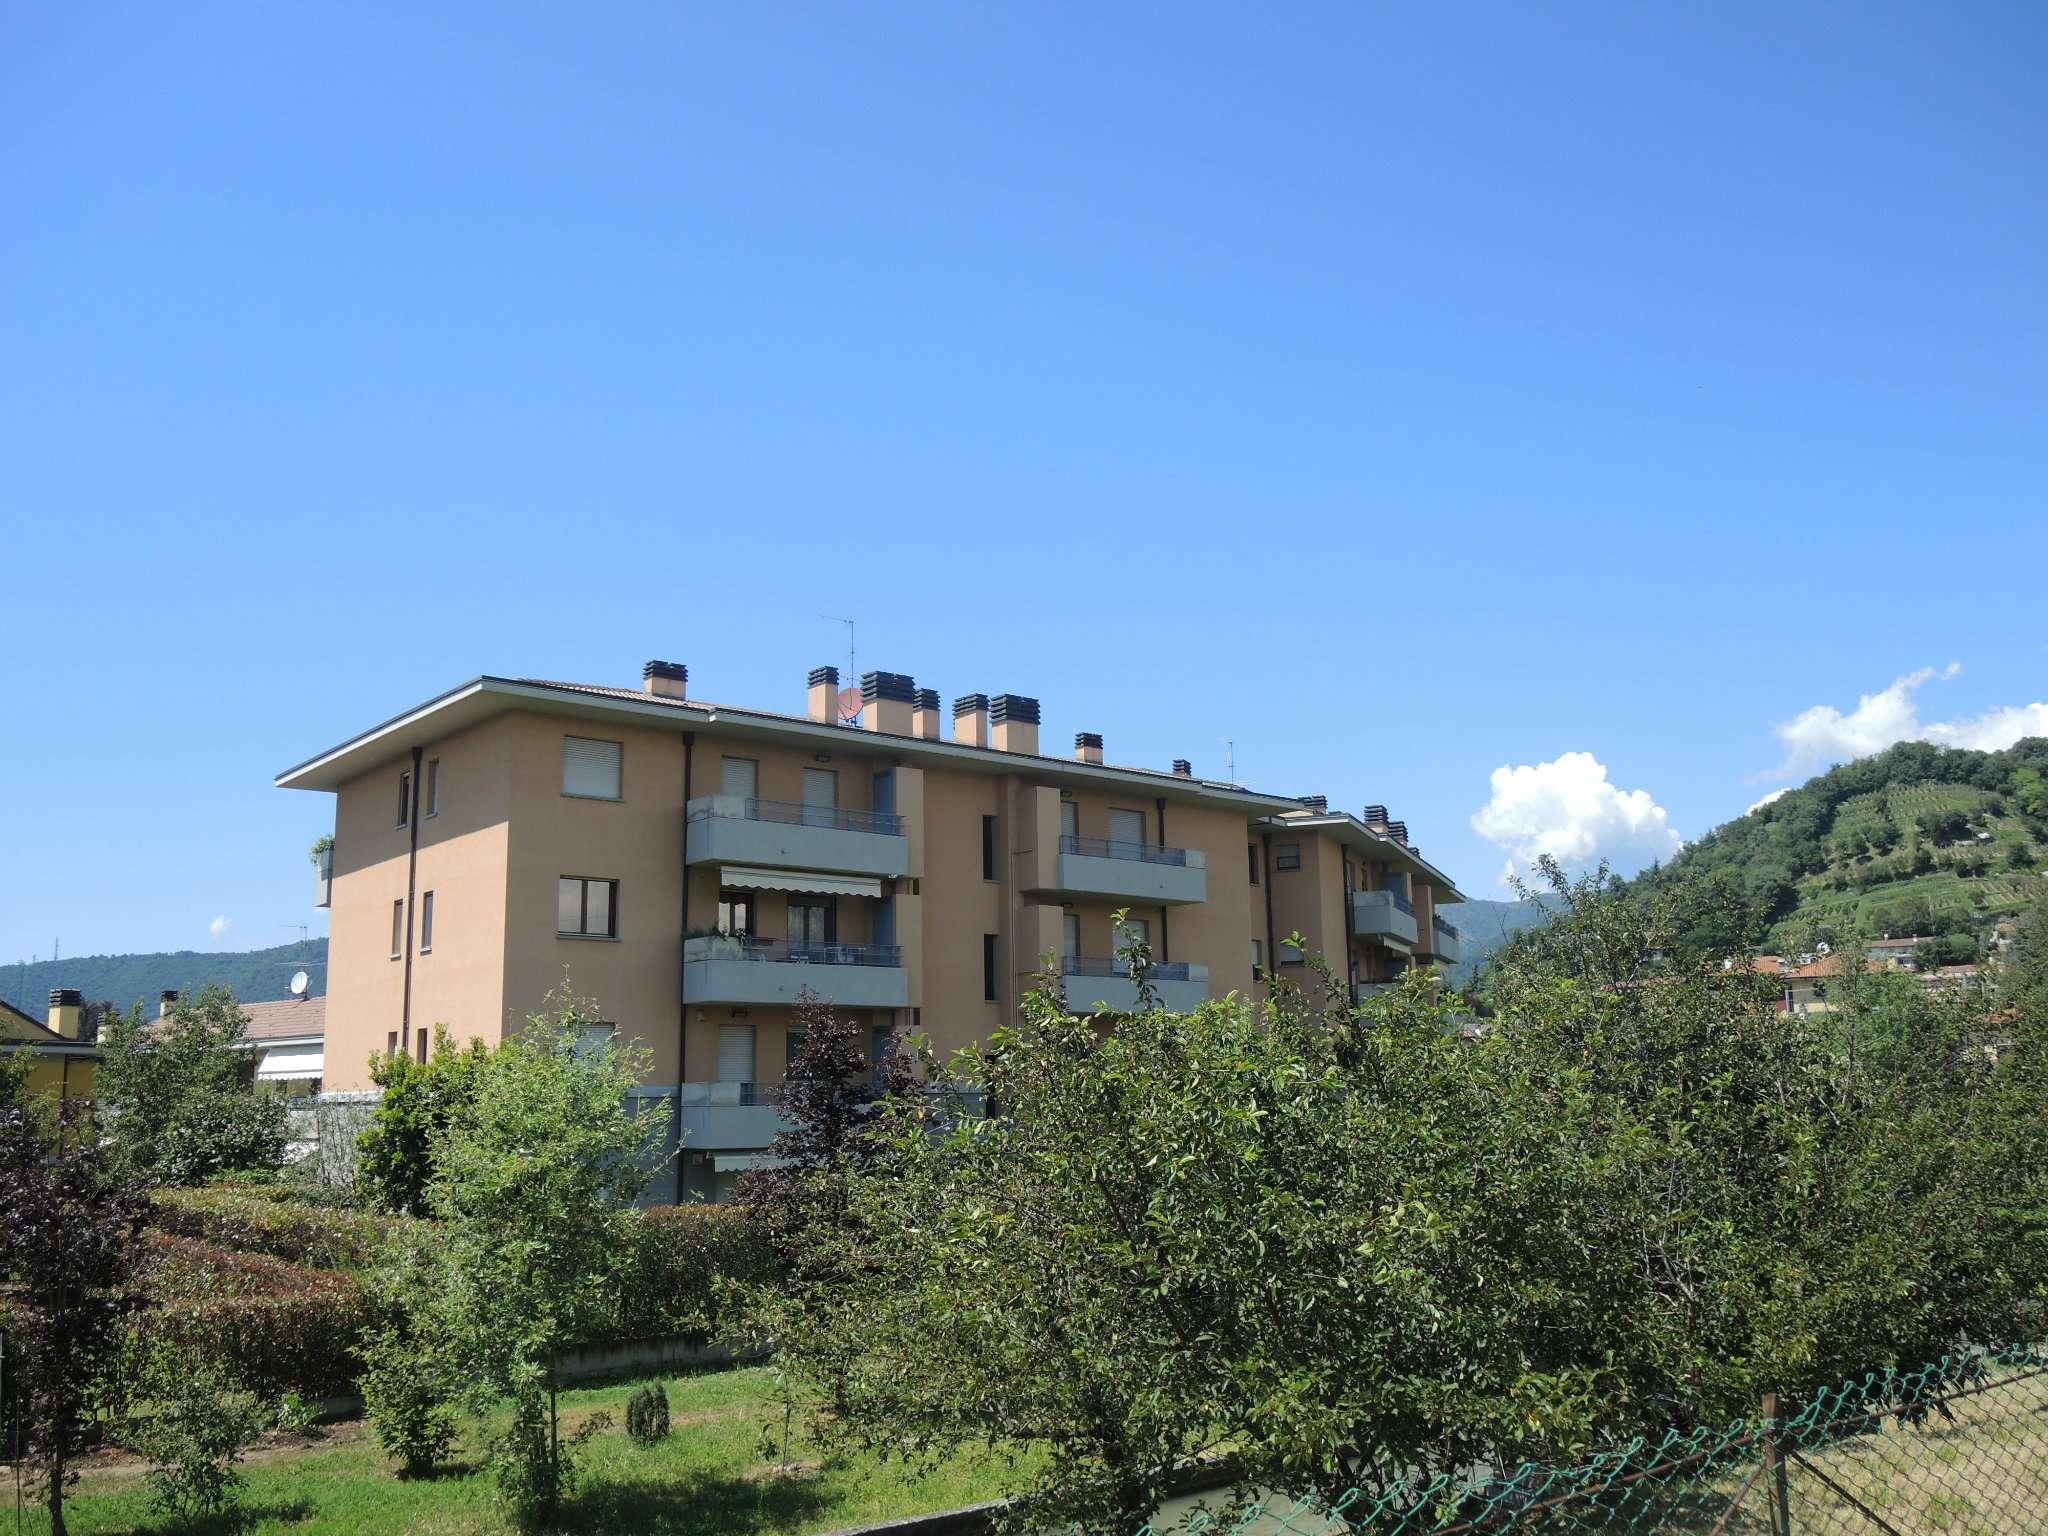 Bilocale Scanzorosciate Via Gorizia 1